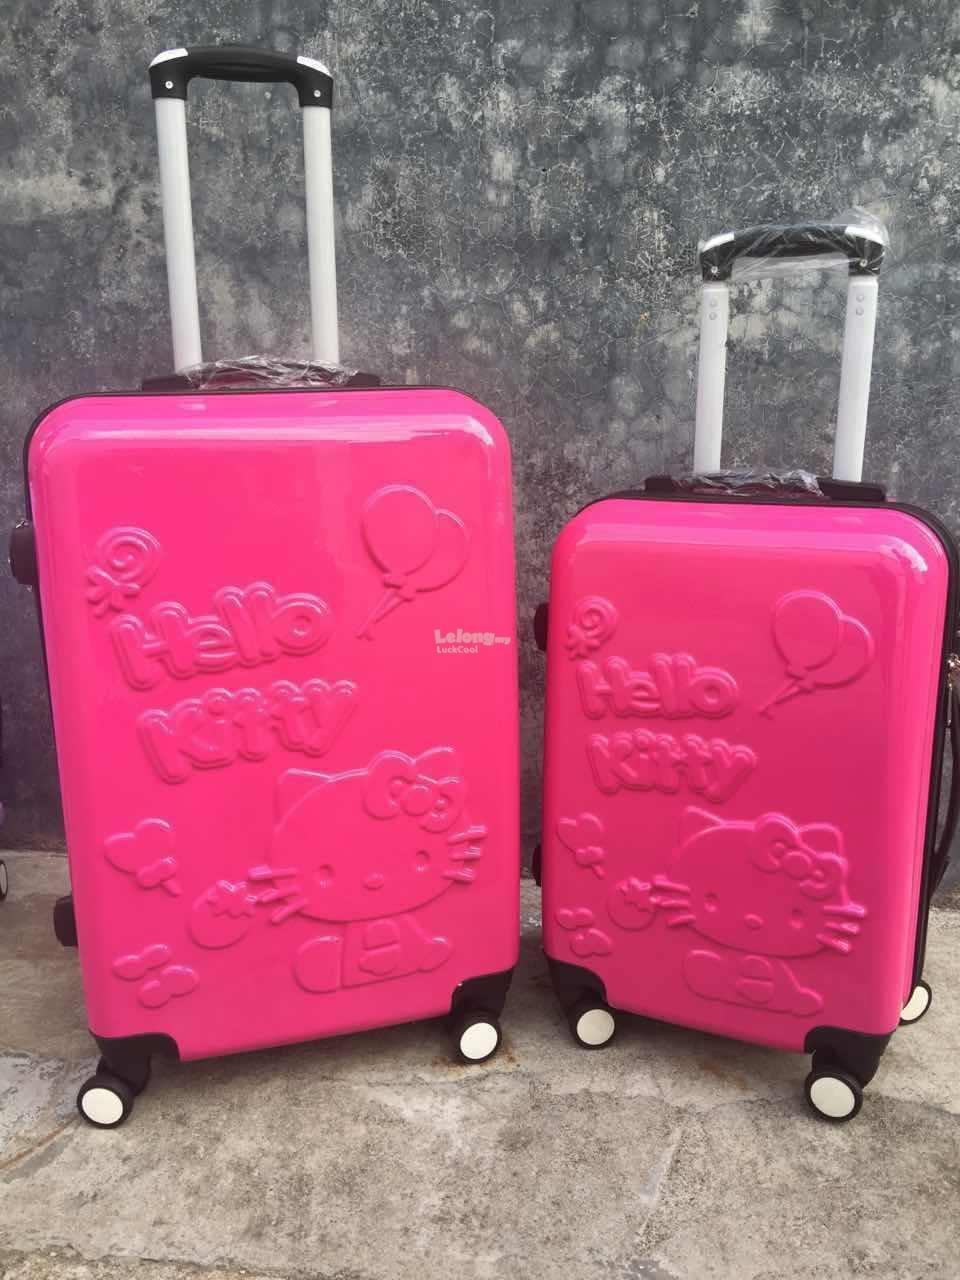 Travel Luggage Bag Cute Hello Kitty N (end 2/9/2017 6:15 PM)